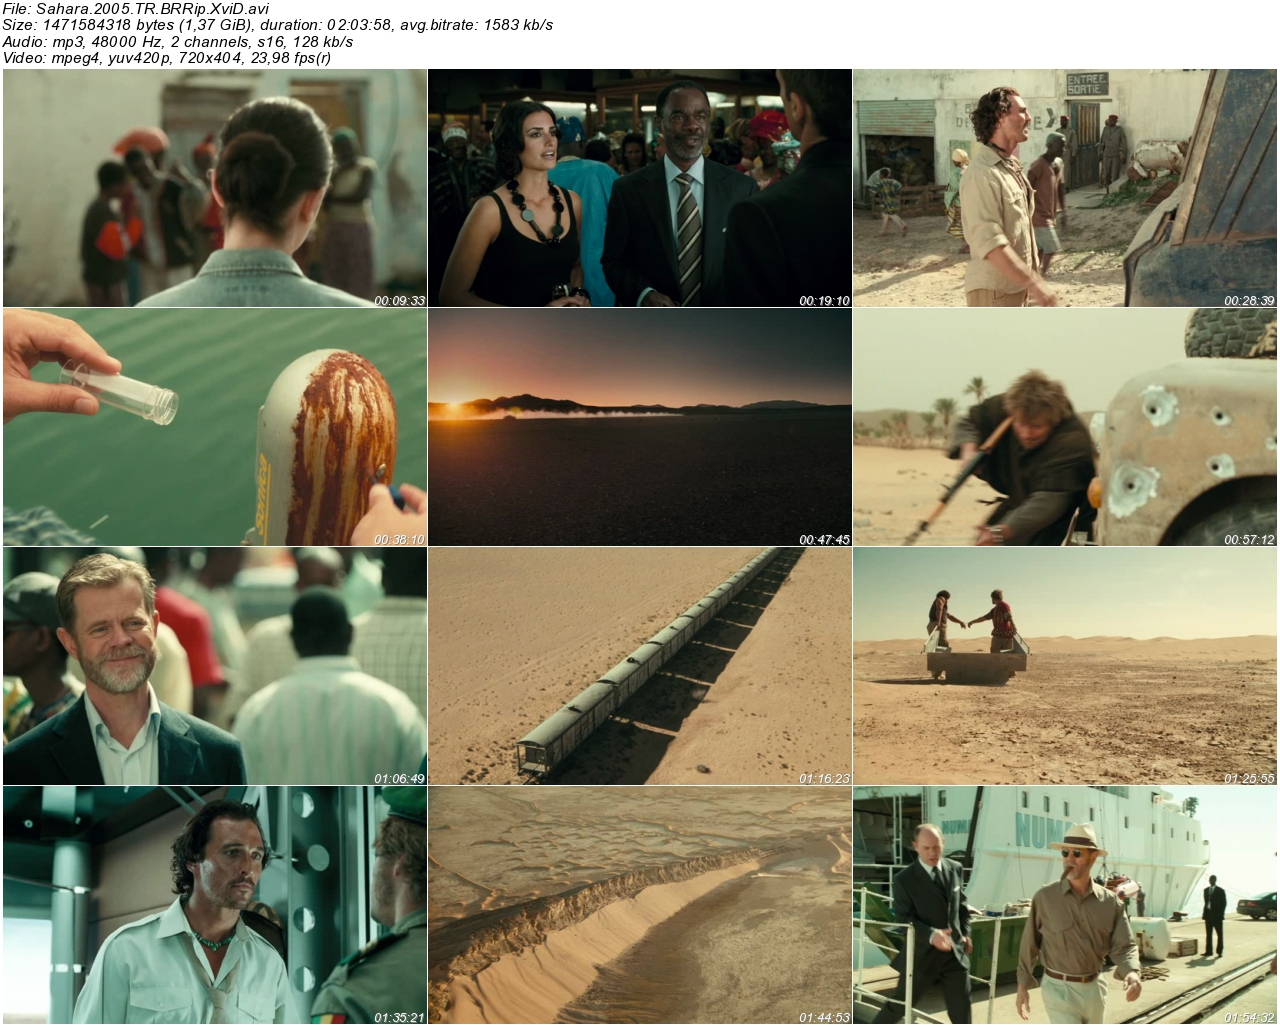 Sahara 2005 - 1080p 720p 480p - Türkçe Dublaj Tek Link indir